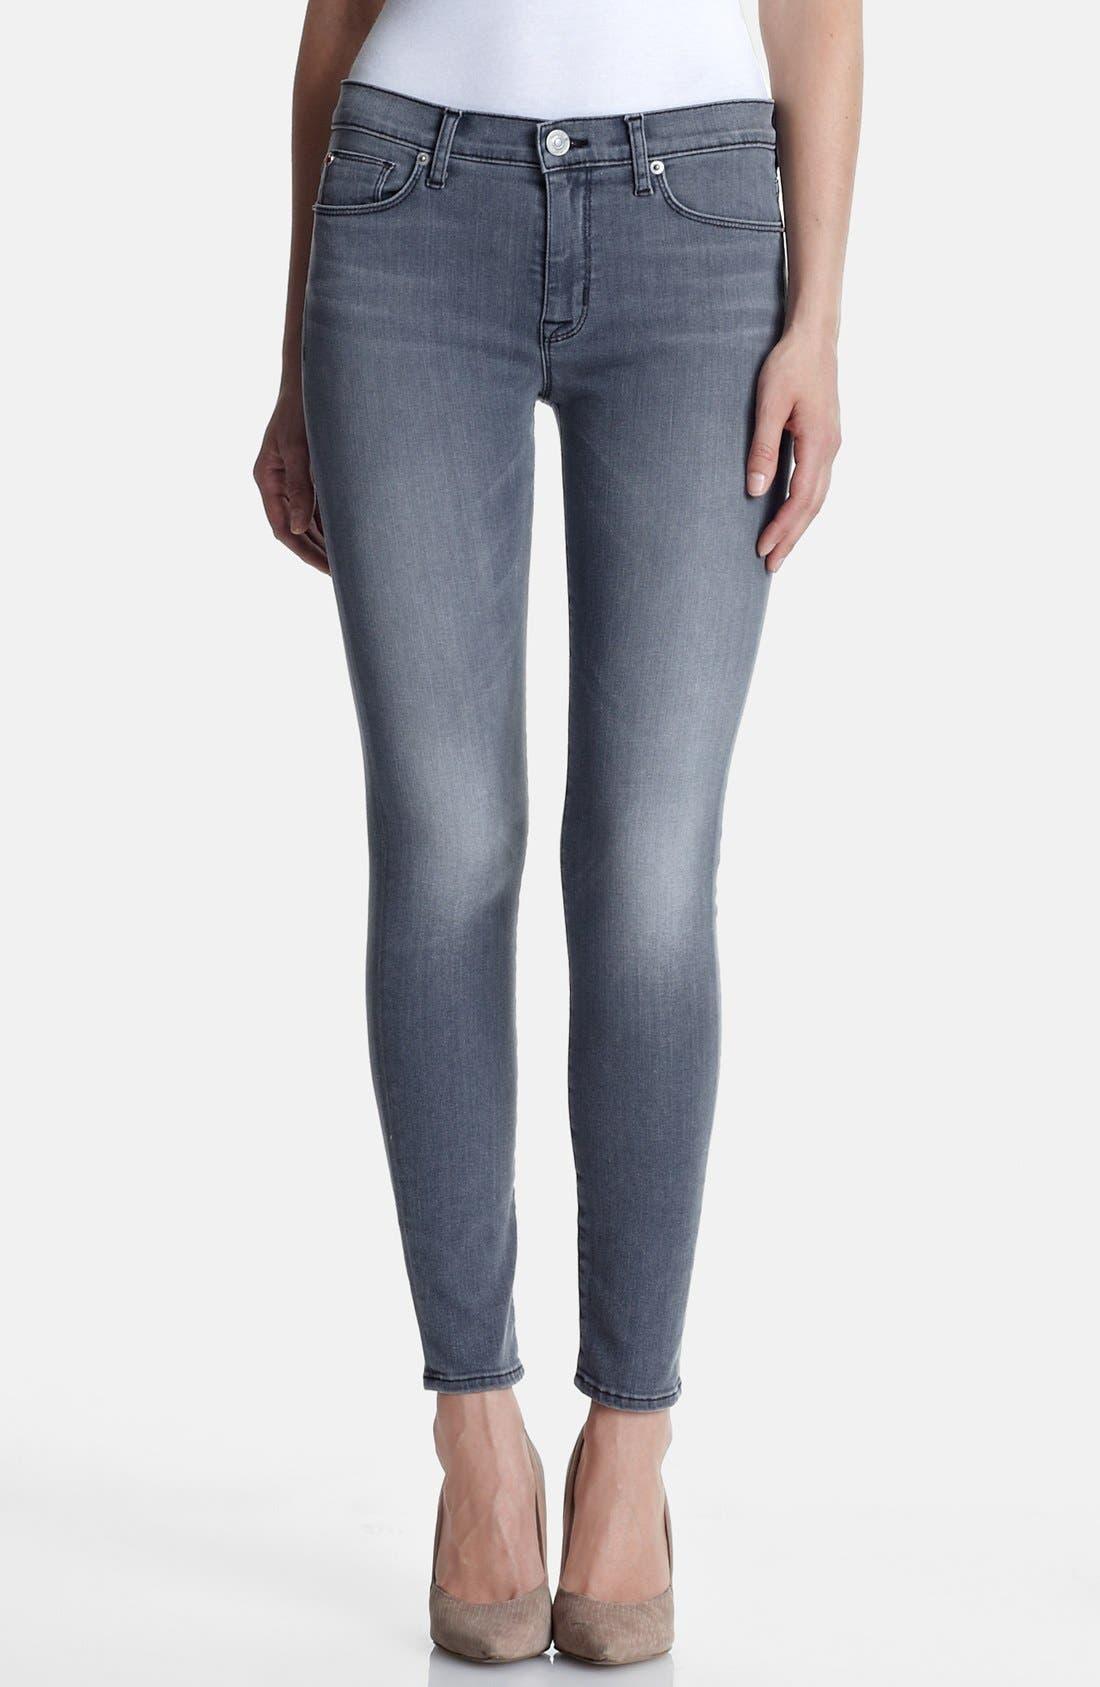 Alternate Image 1 Selected - Hudson Jeans 'Nico' Skinny Stretch Jeans (Rakke)